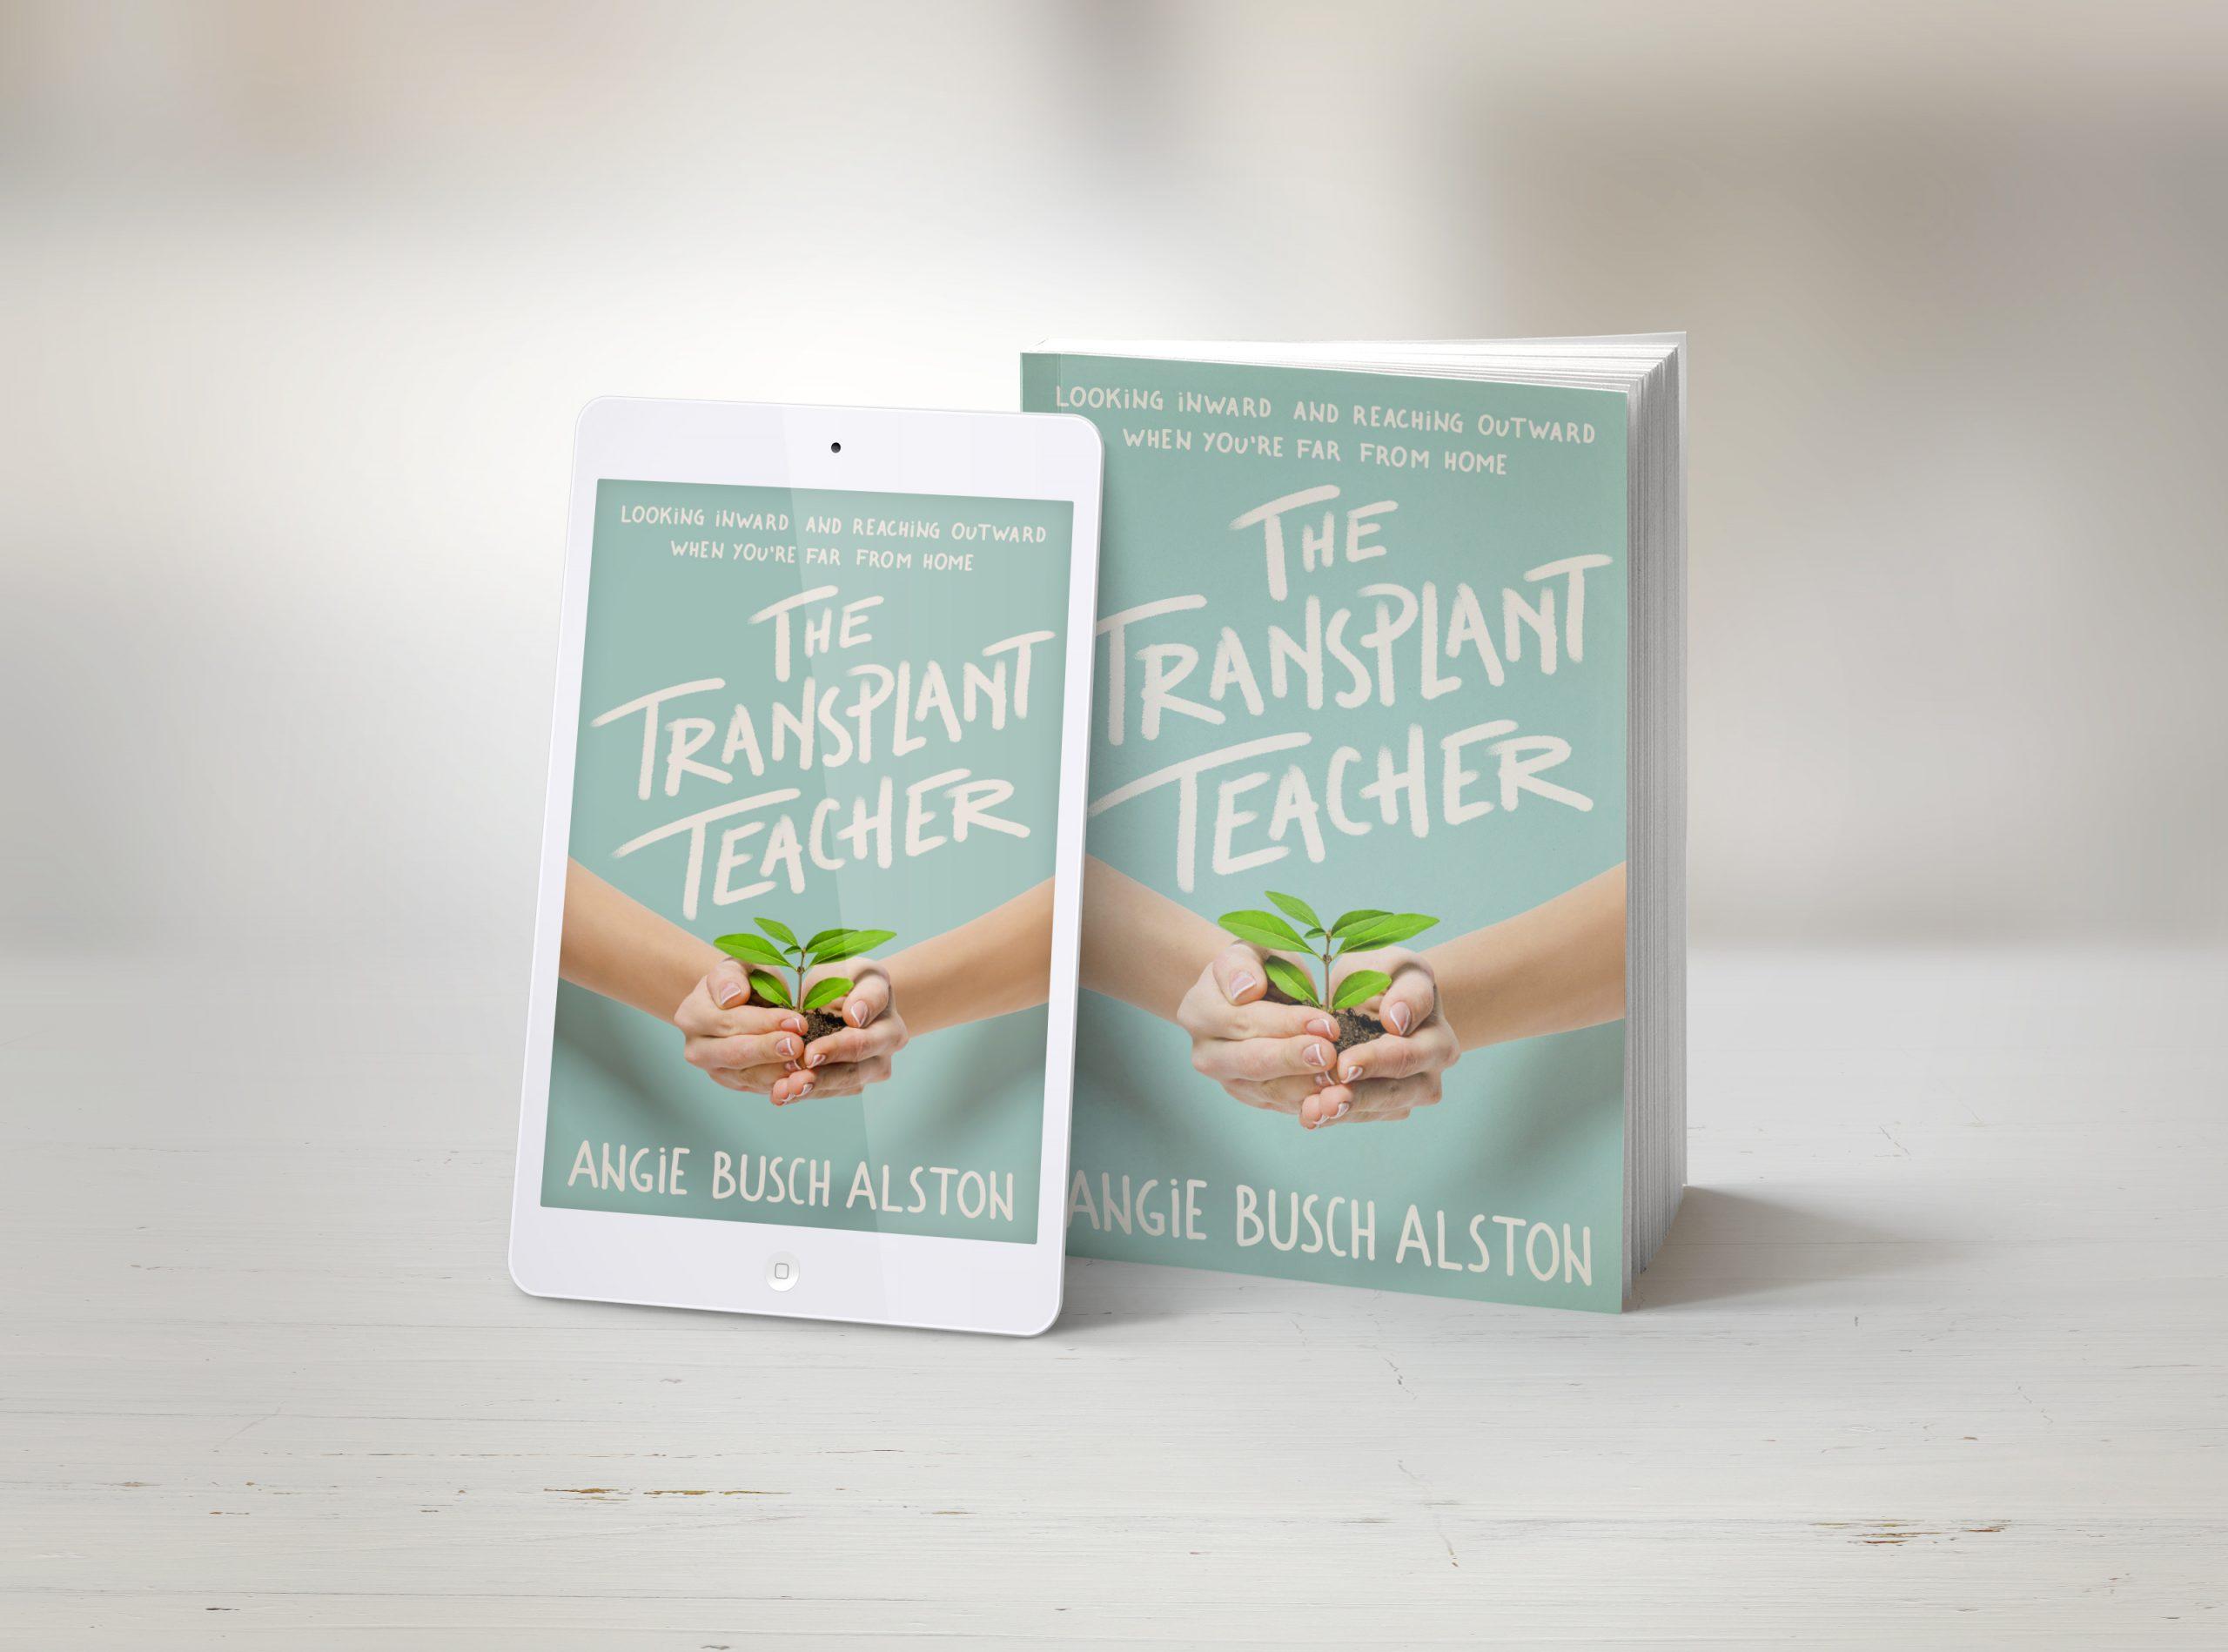 The Transplant Teacher